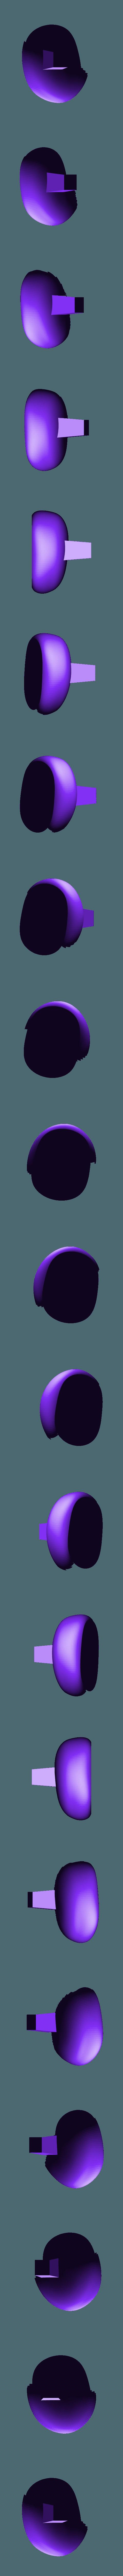 shoe left.stl Download free STL file Toadette from Mario games - Multi-color • 3D printing design, bpitanga